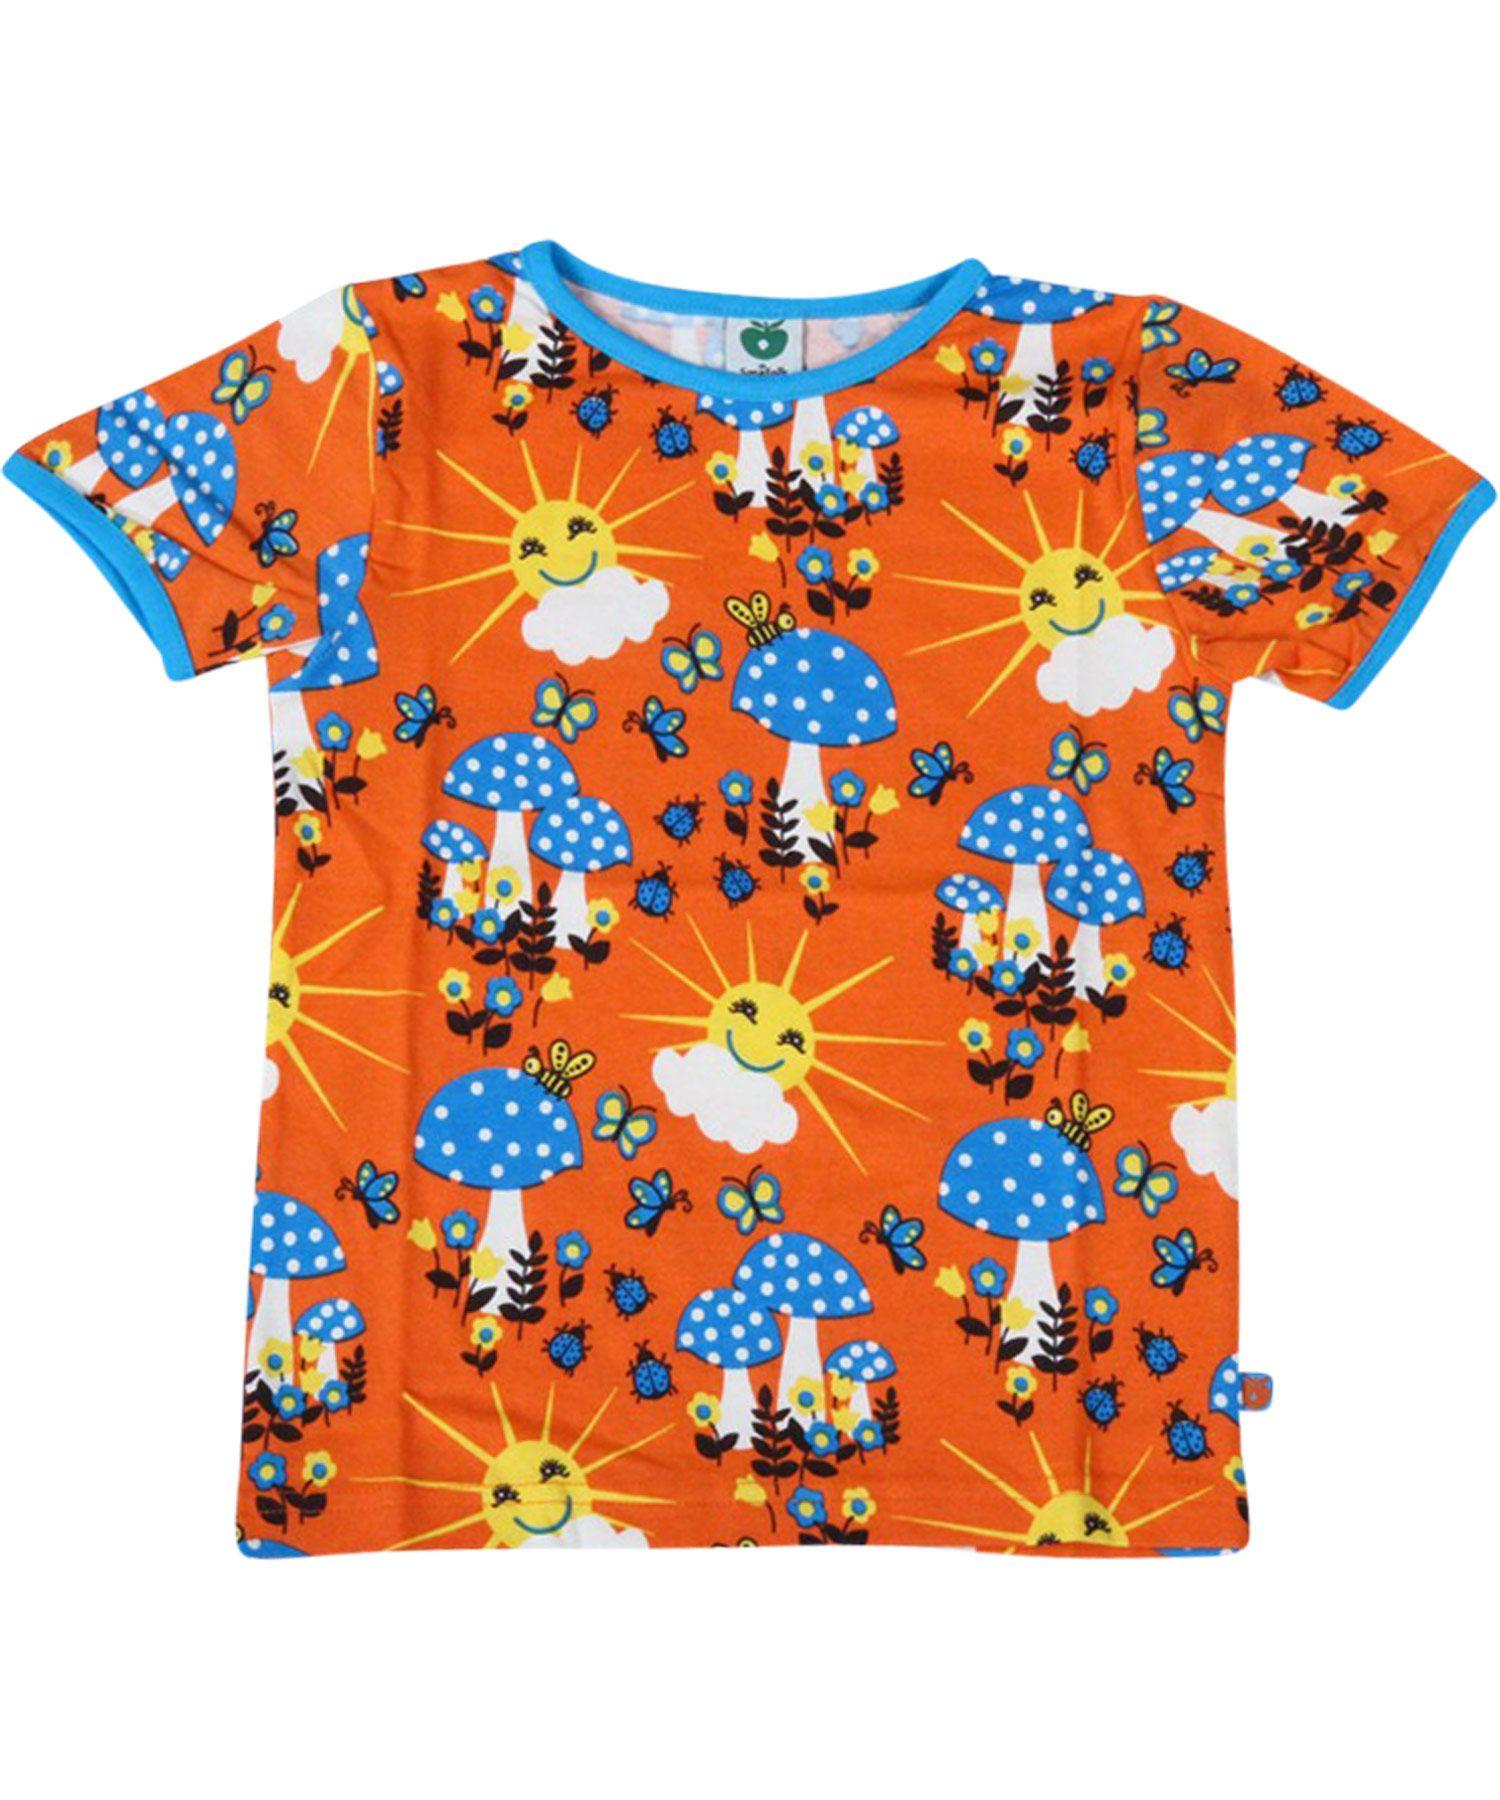 071eb853eba190 Småfolk vrolijke zomer t-shirt met paddestoeltjes print. smafolk .nl.emilea.be